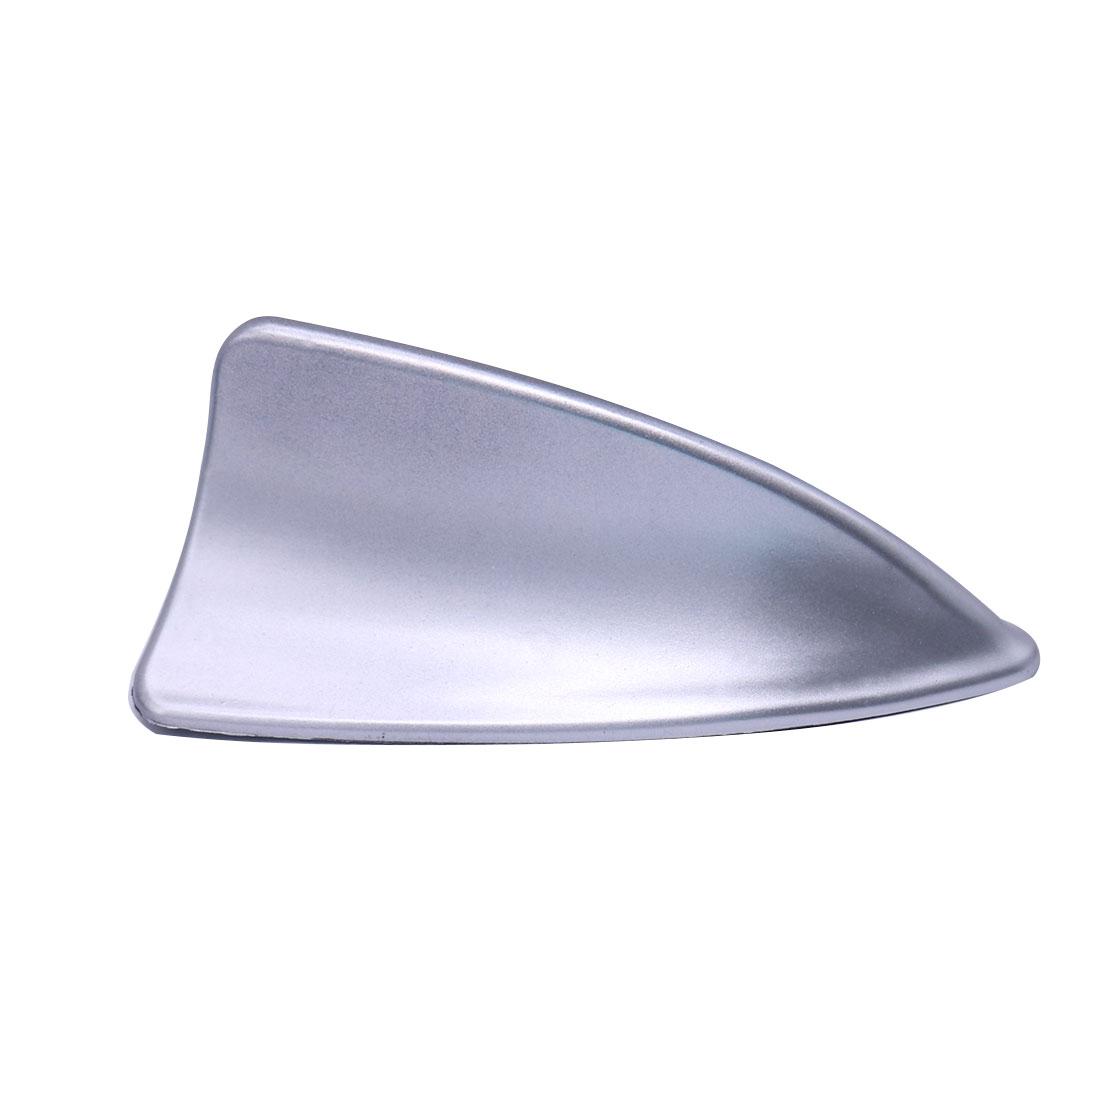 Auto Car Shark Fin Roof Antenna Radio Signal Aerial Decor Home Tool Universal